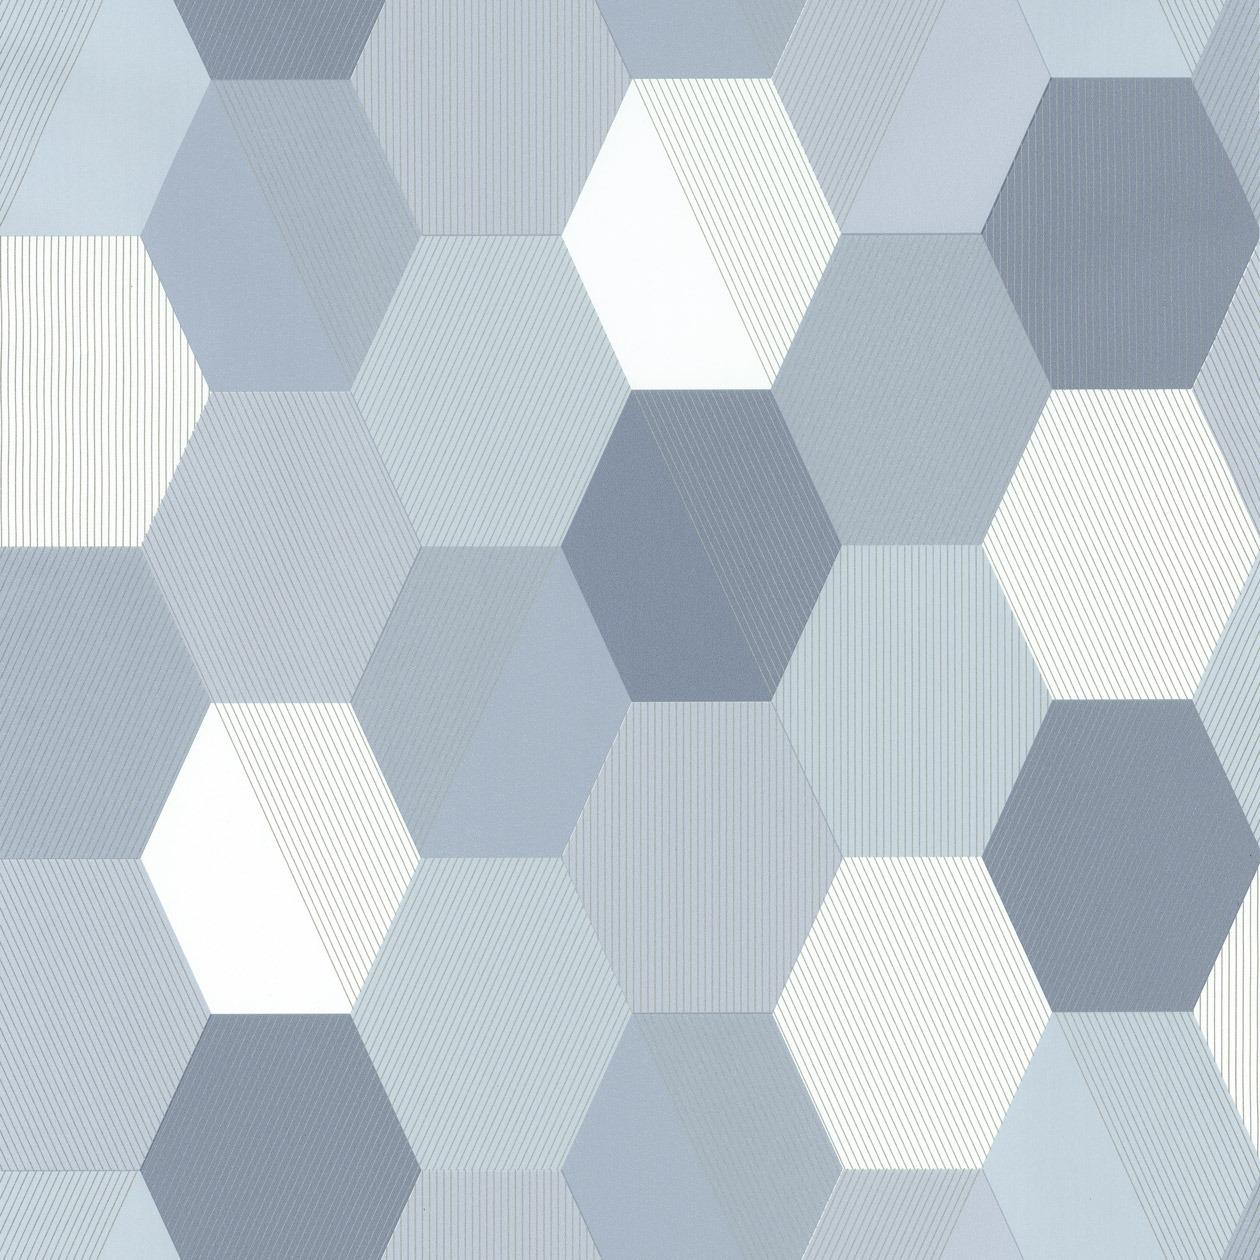 Színes skandináv stílusú tapéta